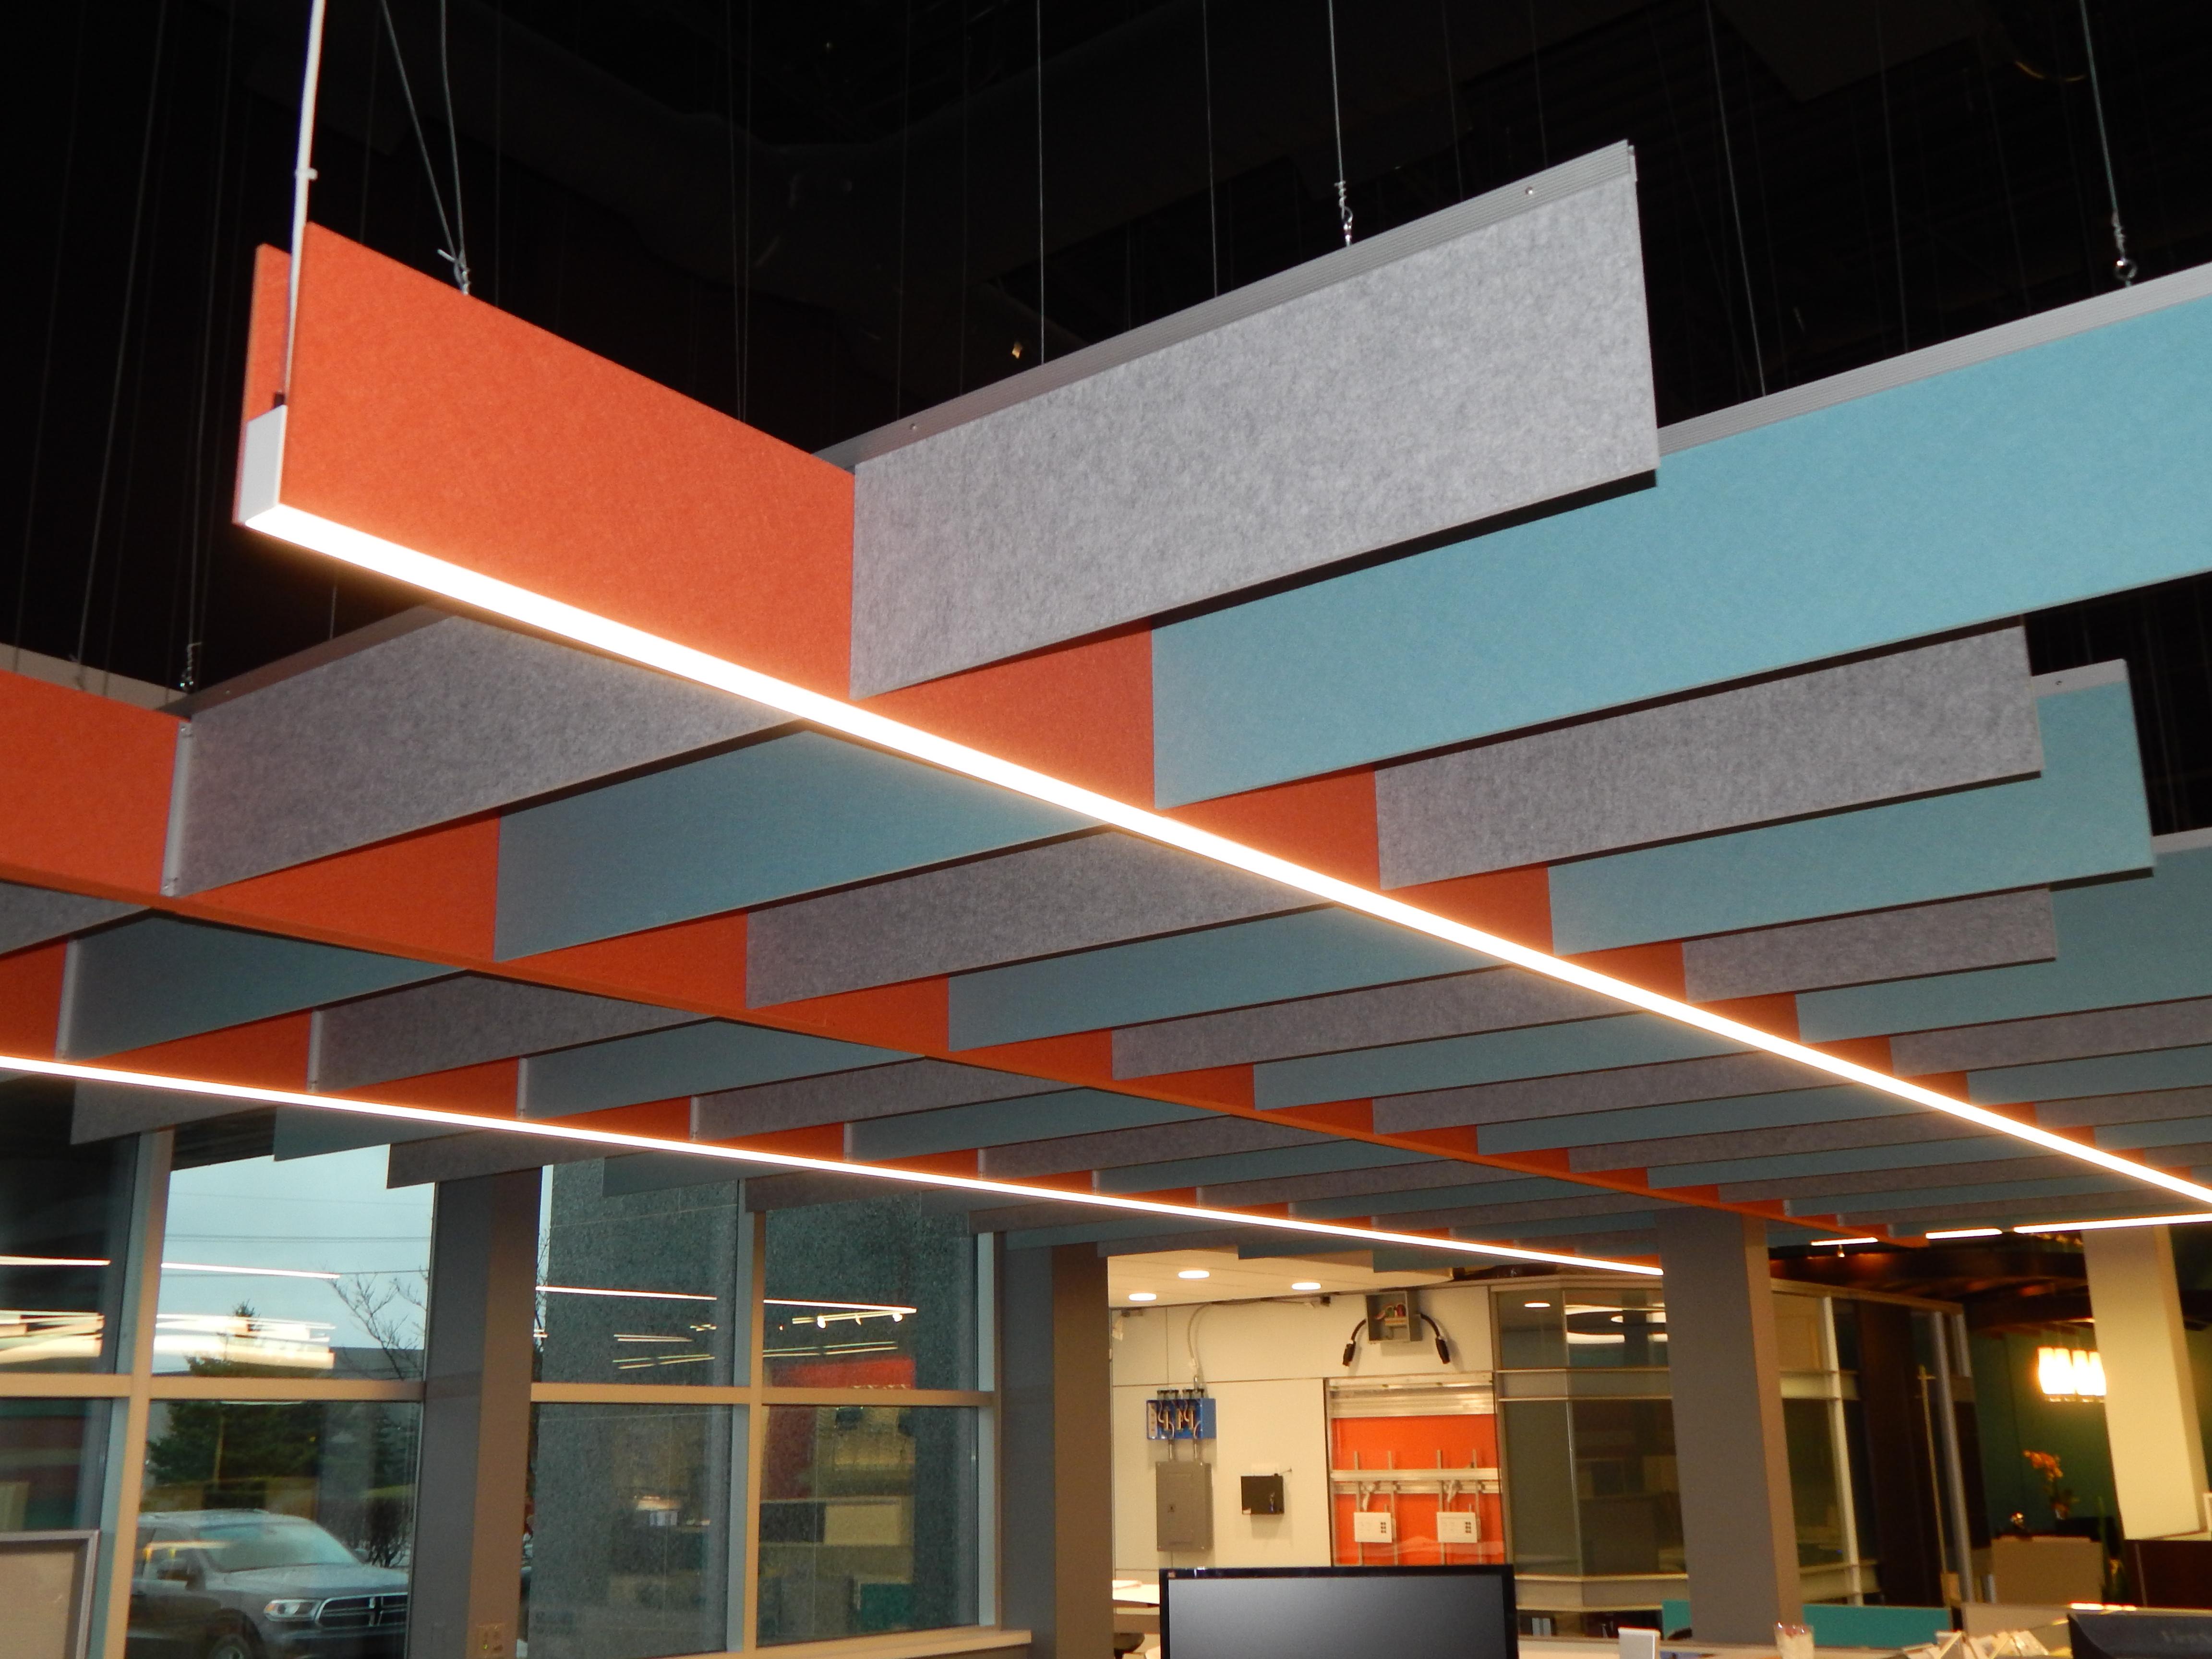 H Baffle 295 442 551 custom ceiling grid American Interiors 5